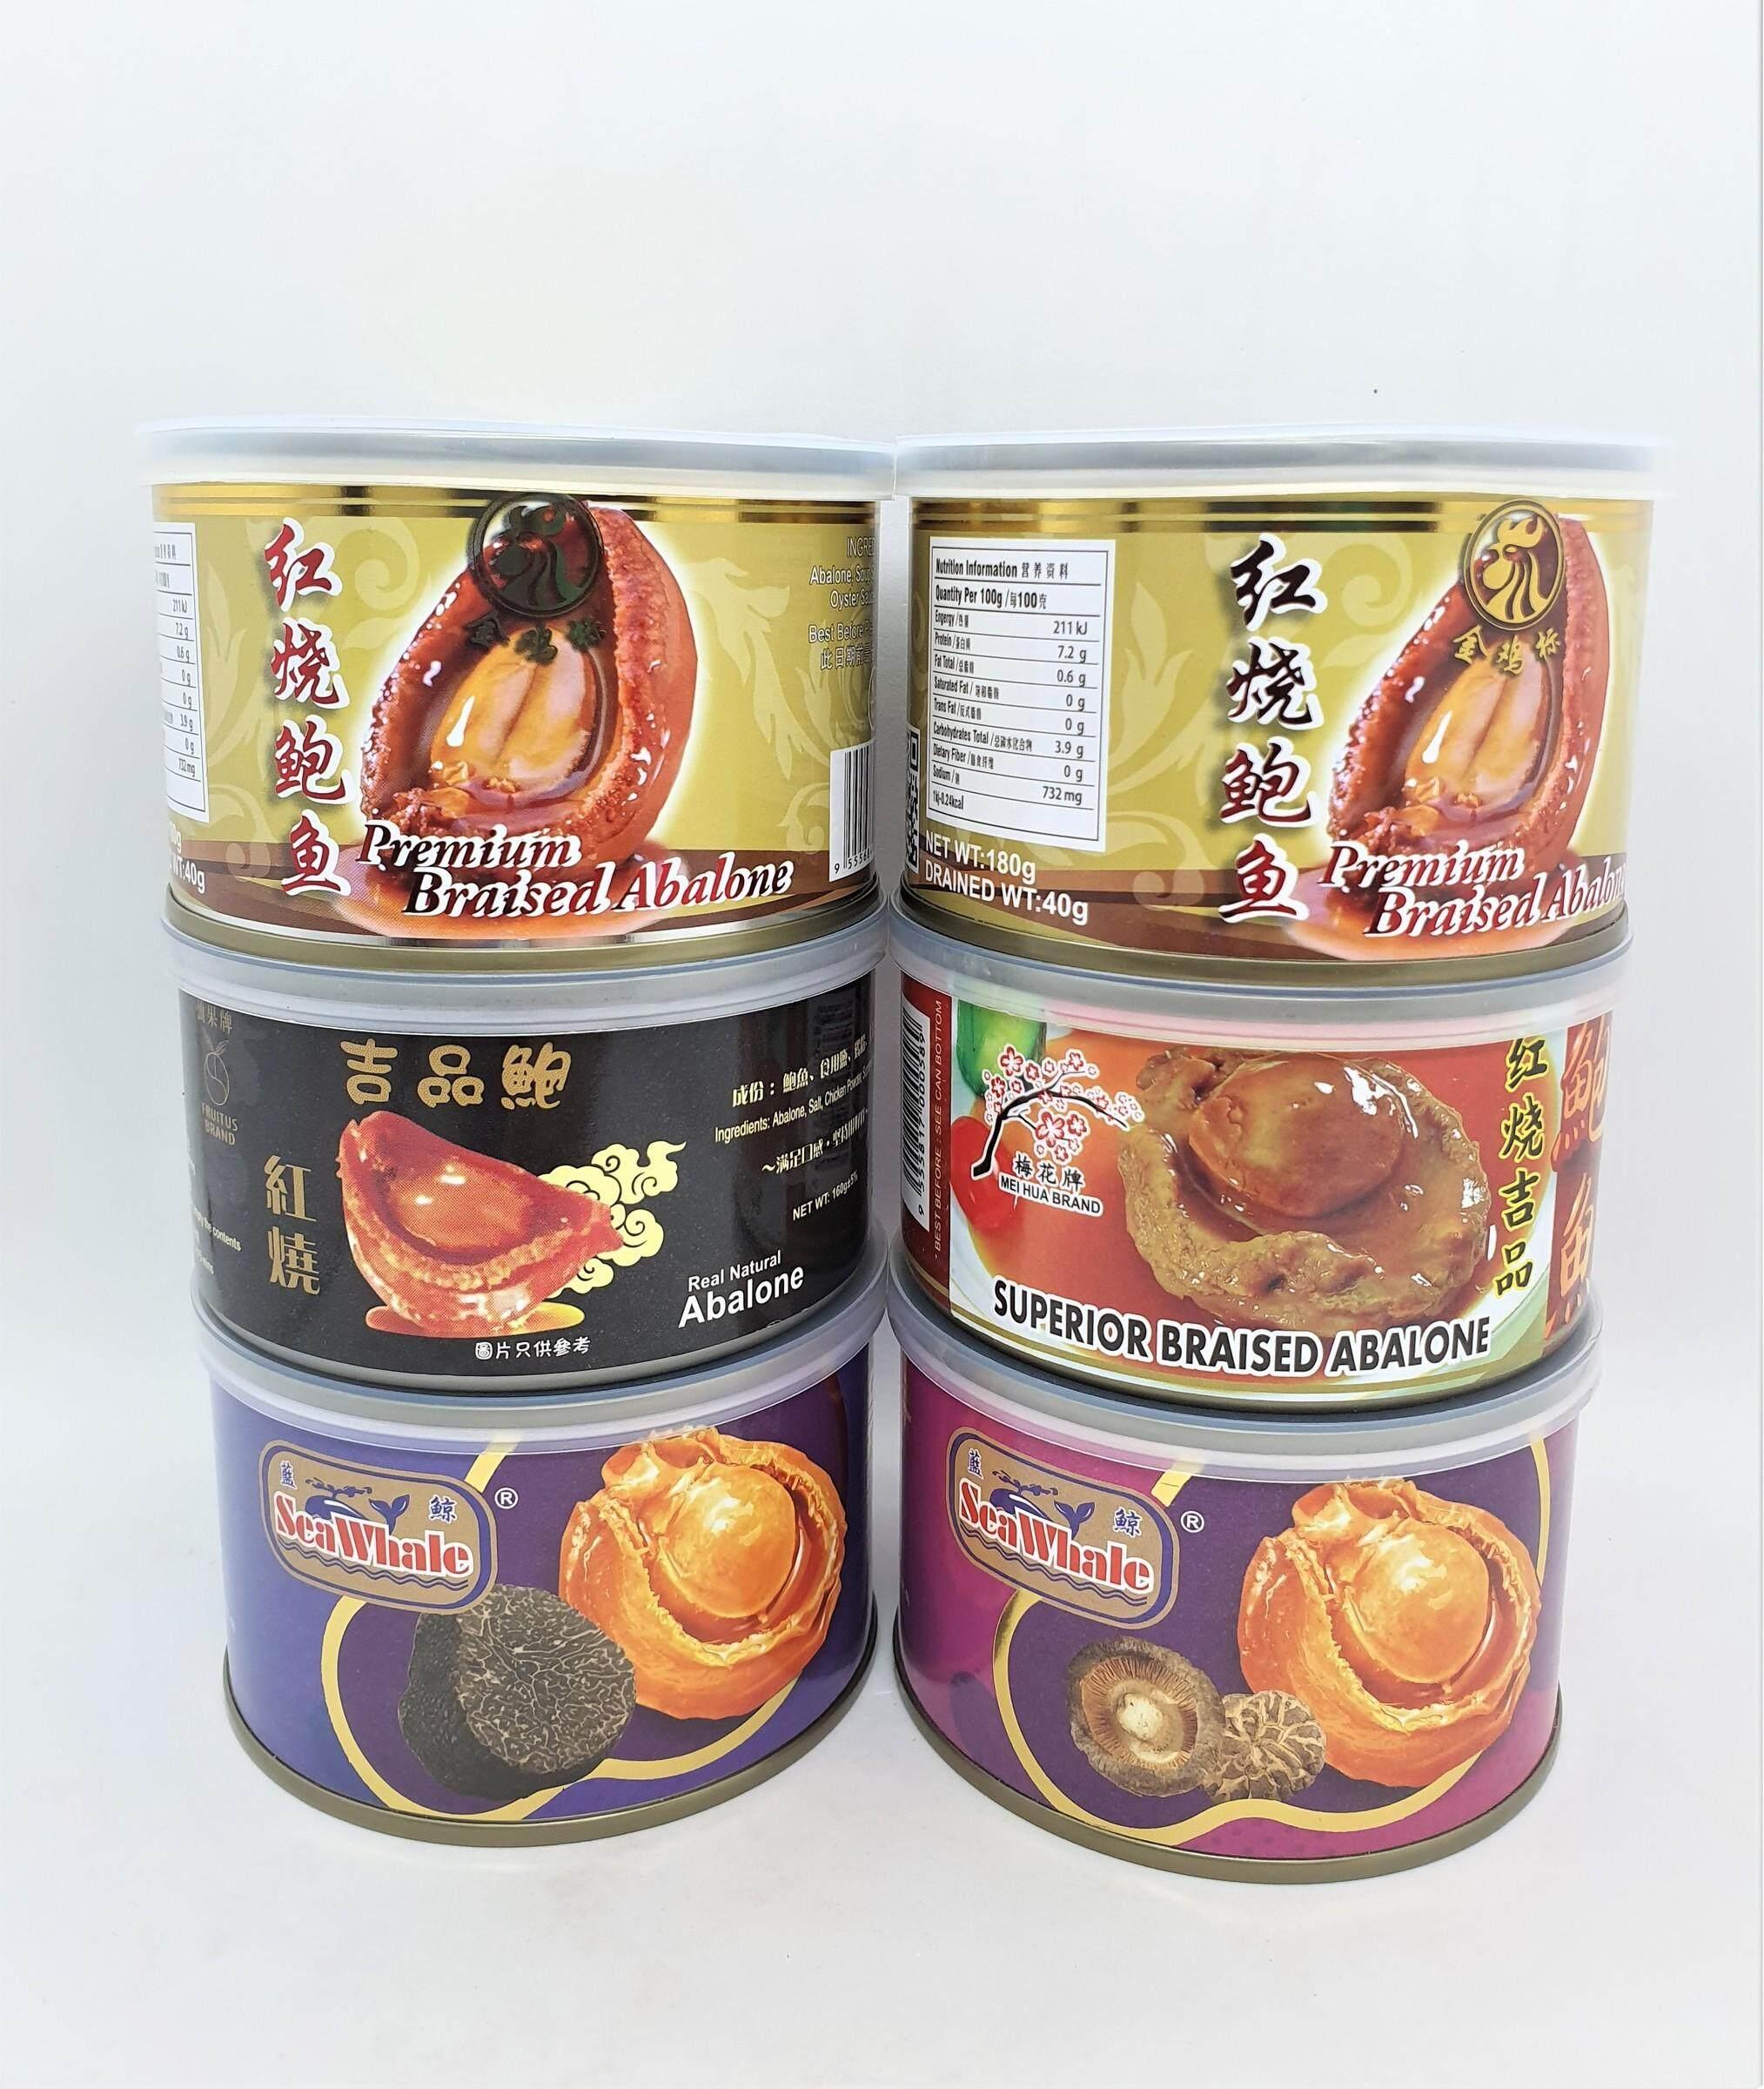 Braised Abalone Buy 5 Get 1 Free 红烧鲍鱼买5加送1罐